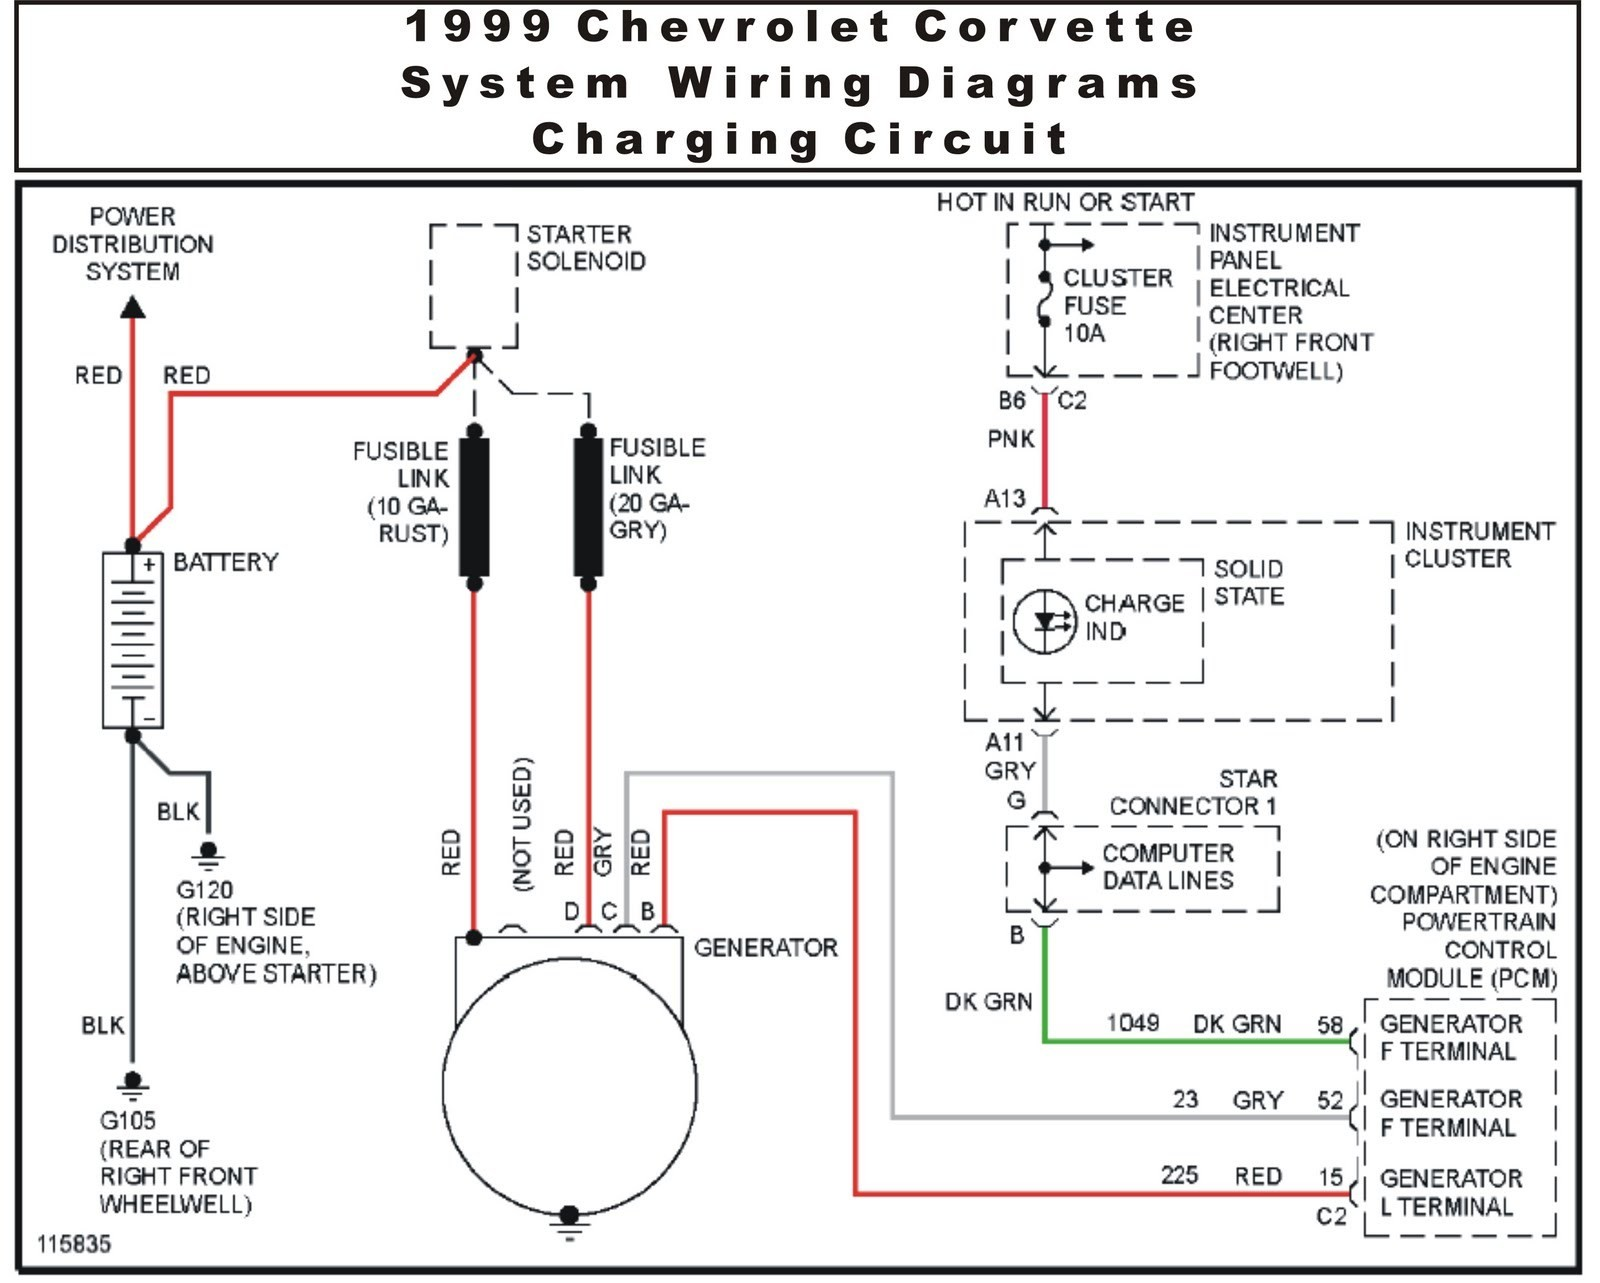 photoelectric cell wiring diagram 2005 chevy silverado radio harness sensor my